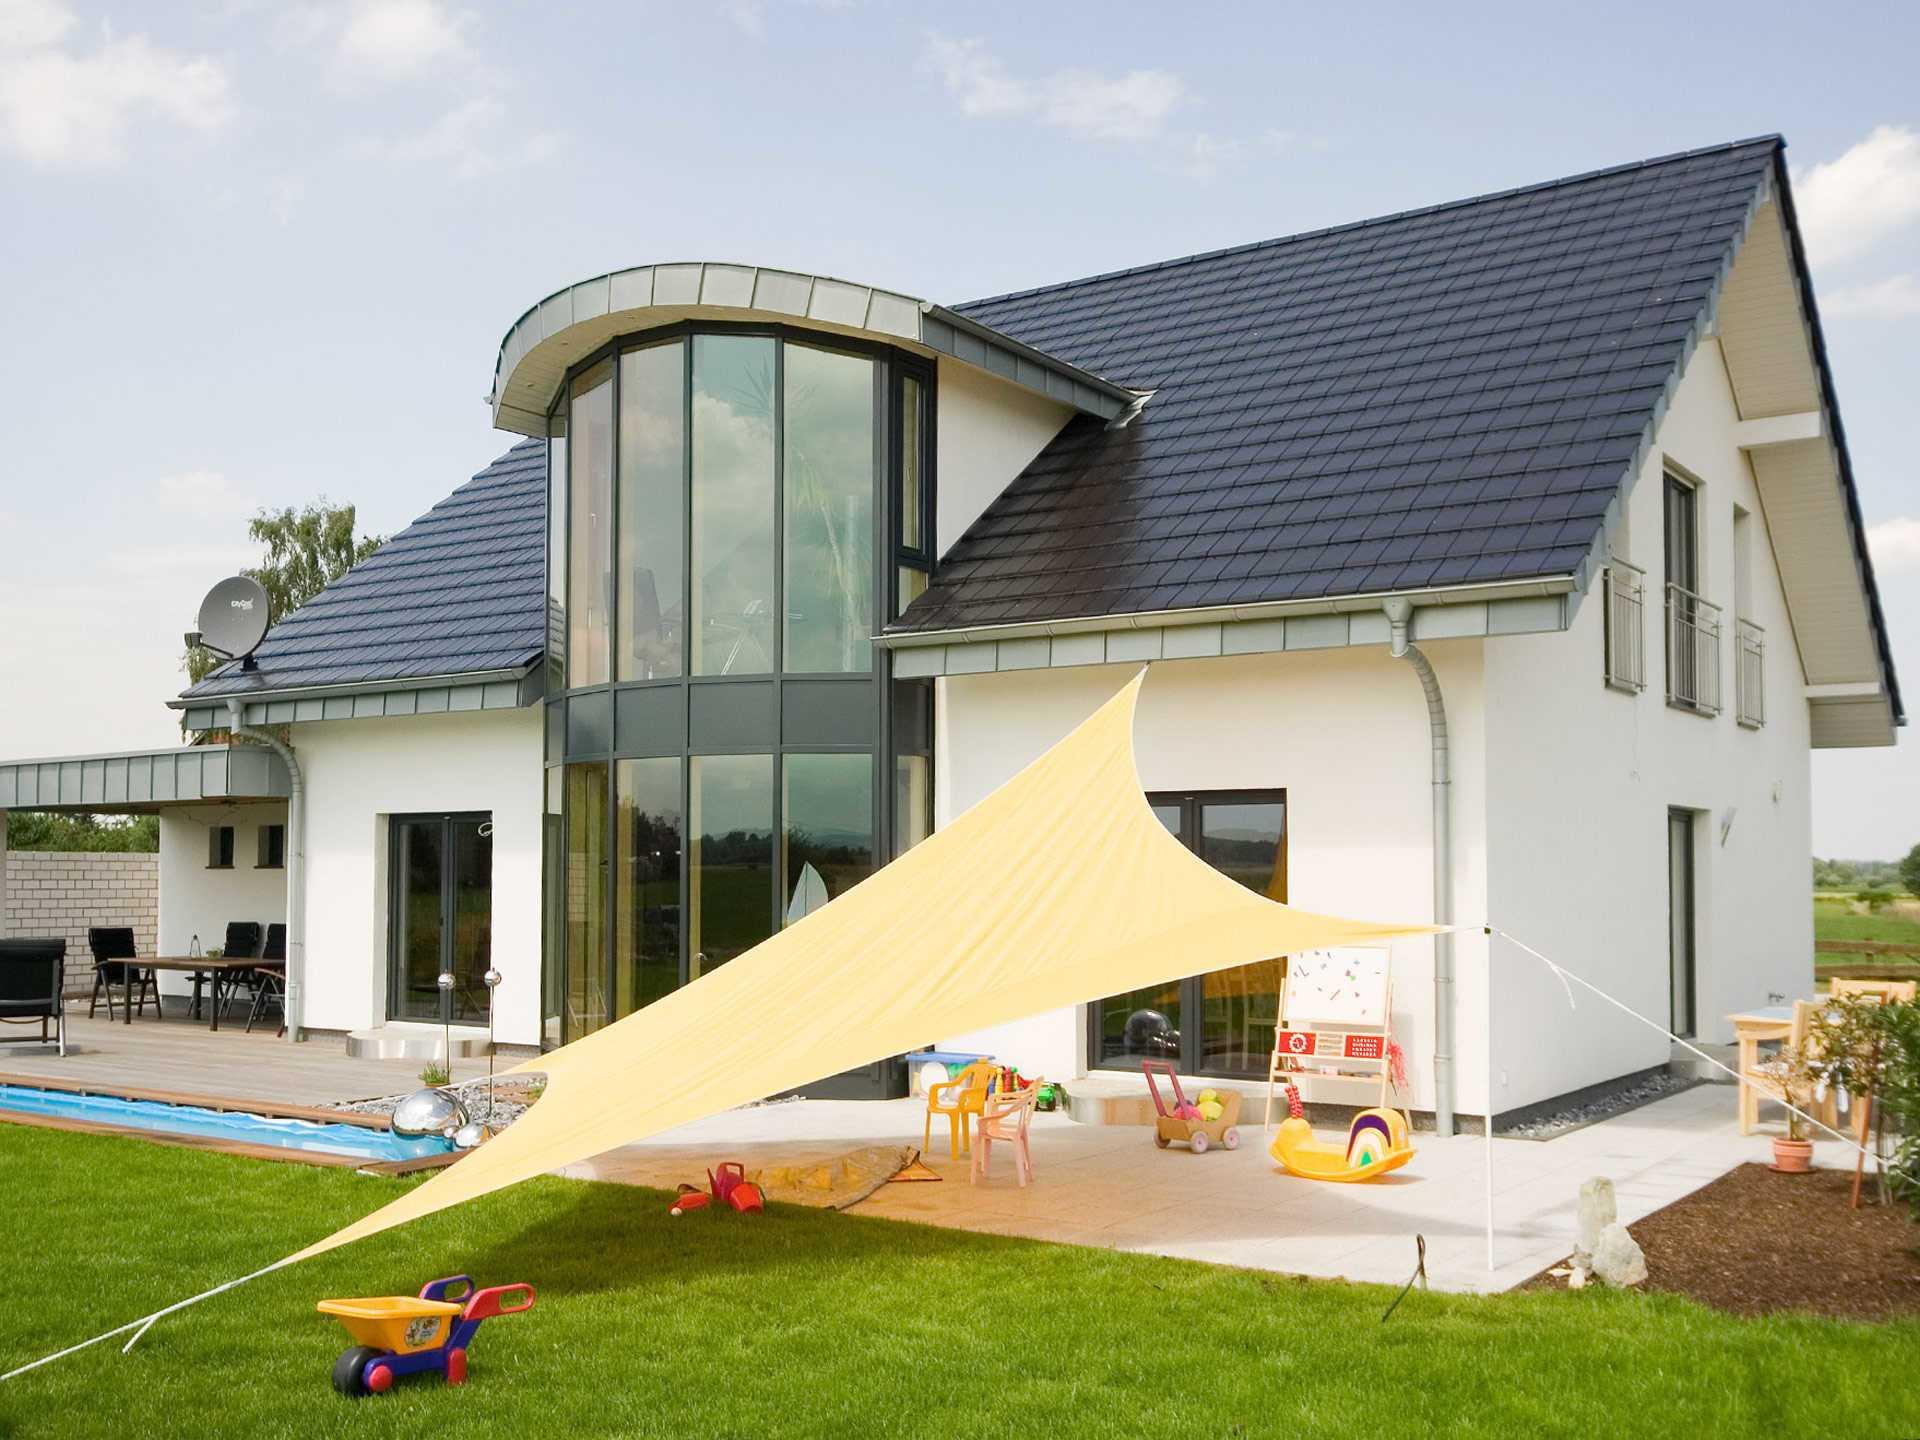 Theodor Roreger - Passivhaus